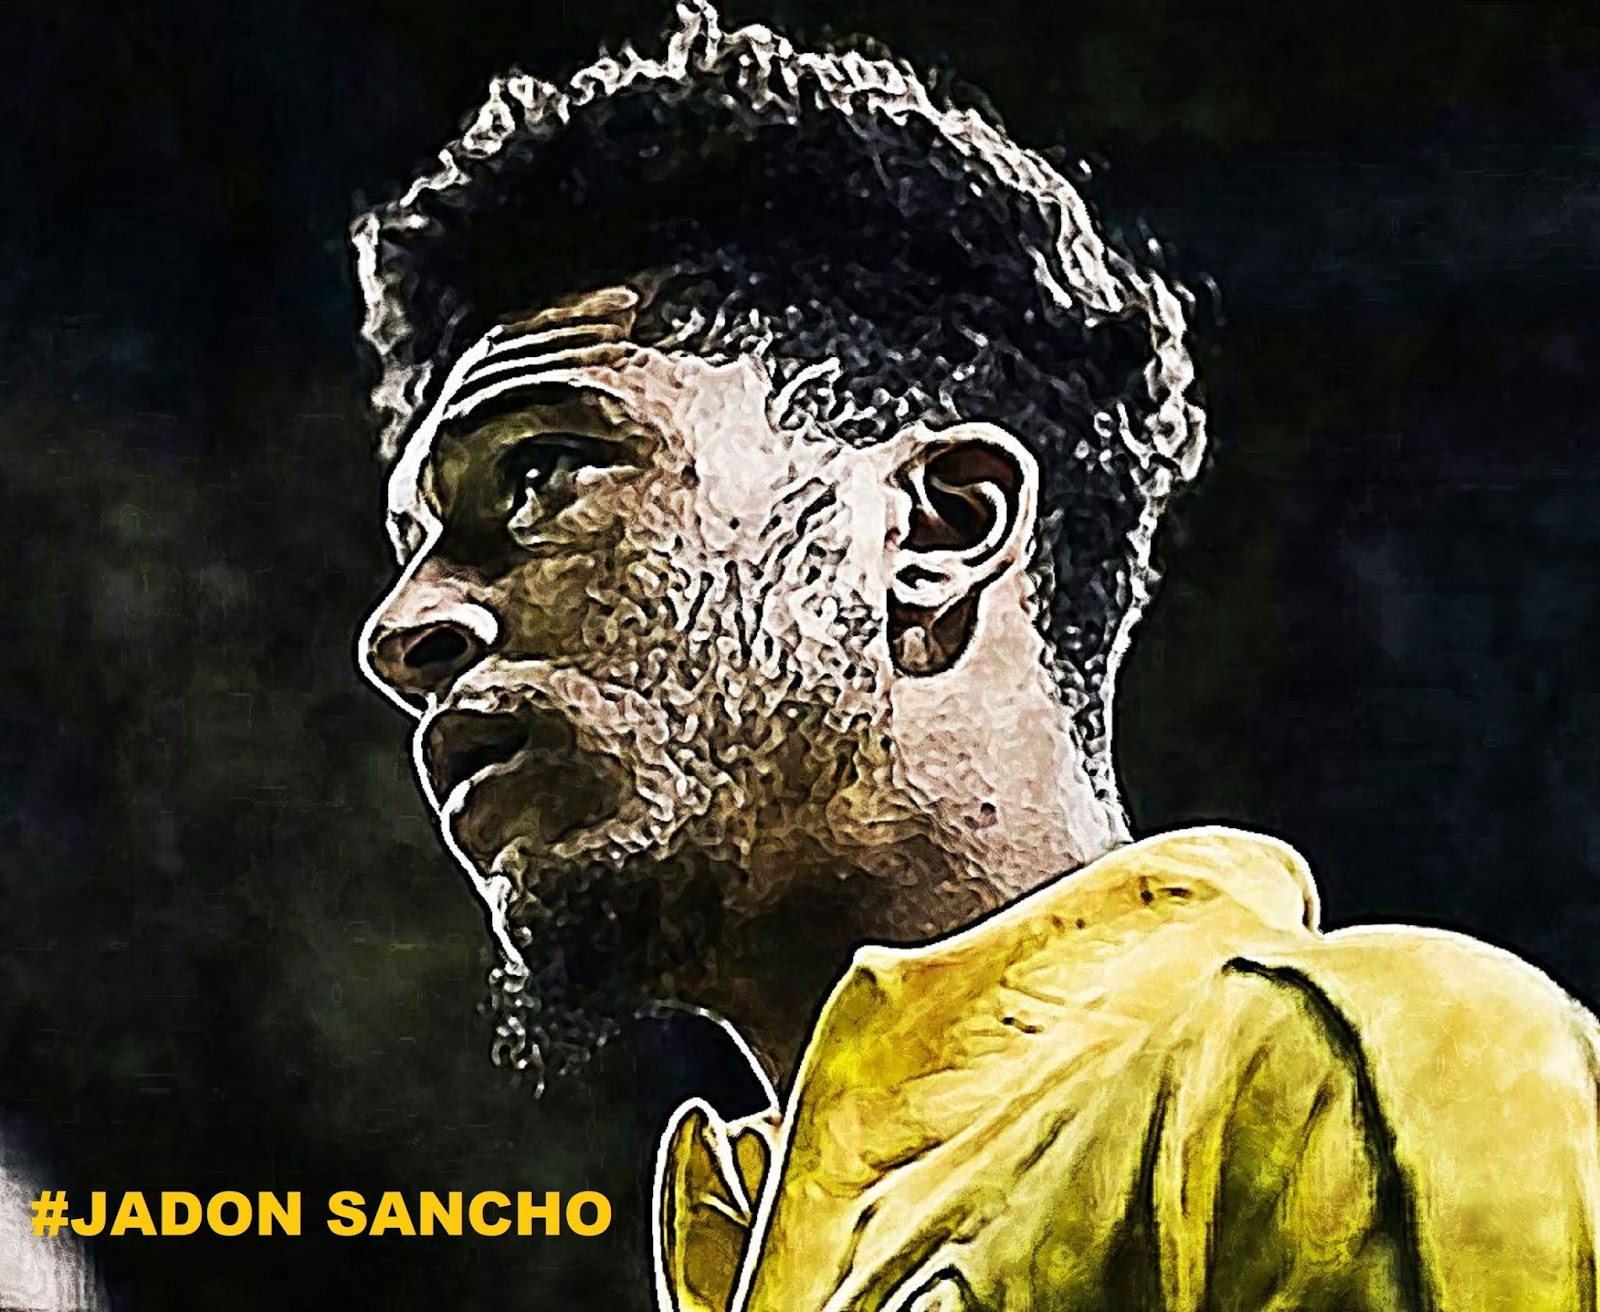 JADON SANCHO 3